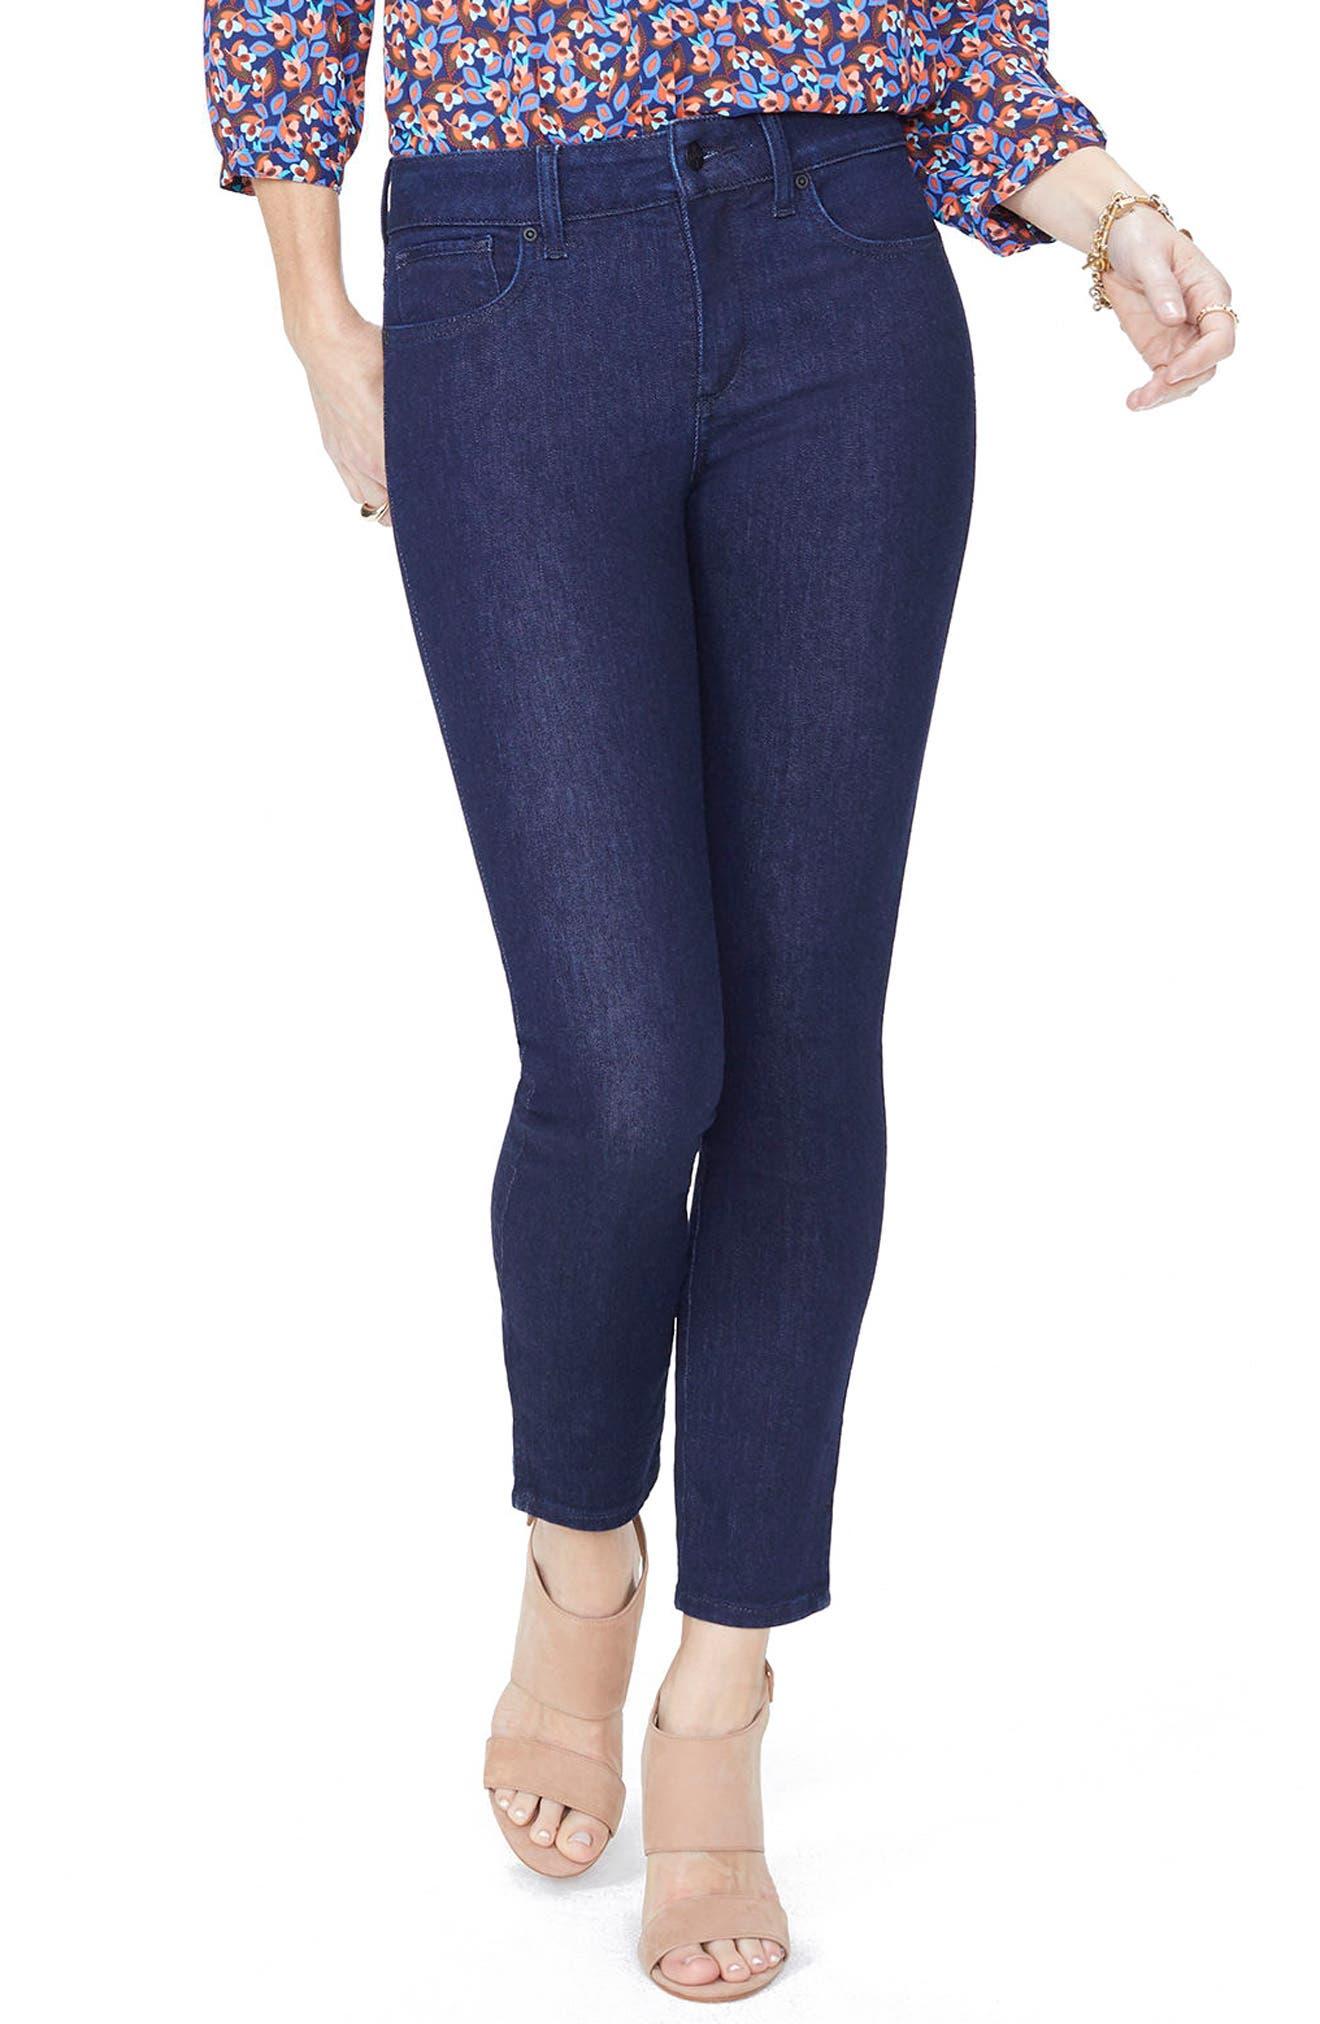 NYDJ Ami Side Slit Stretch Ankle Skinny Jeans (Regular & Petite)  (Rinse)